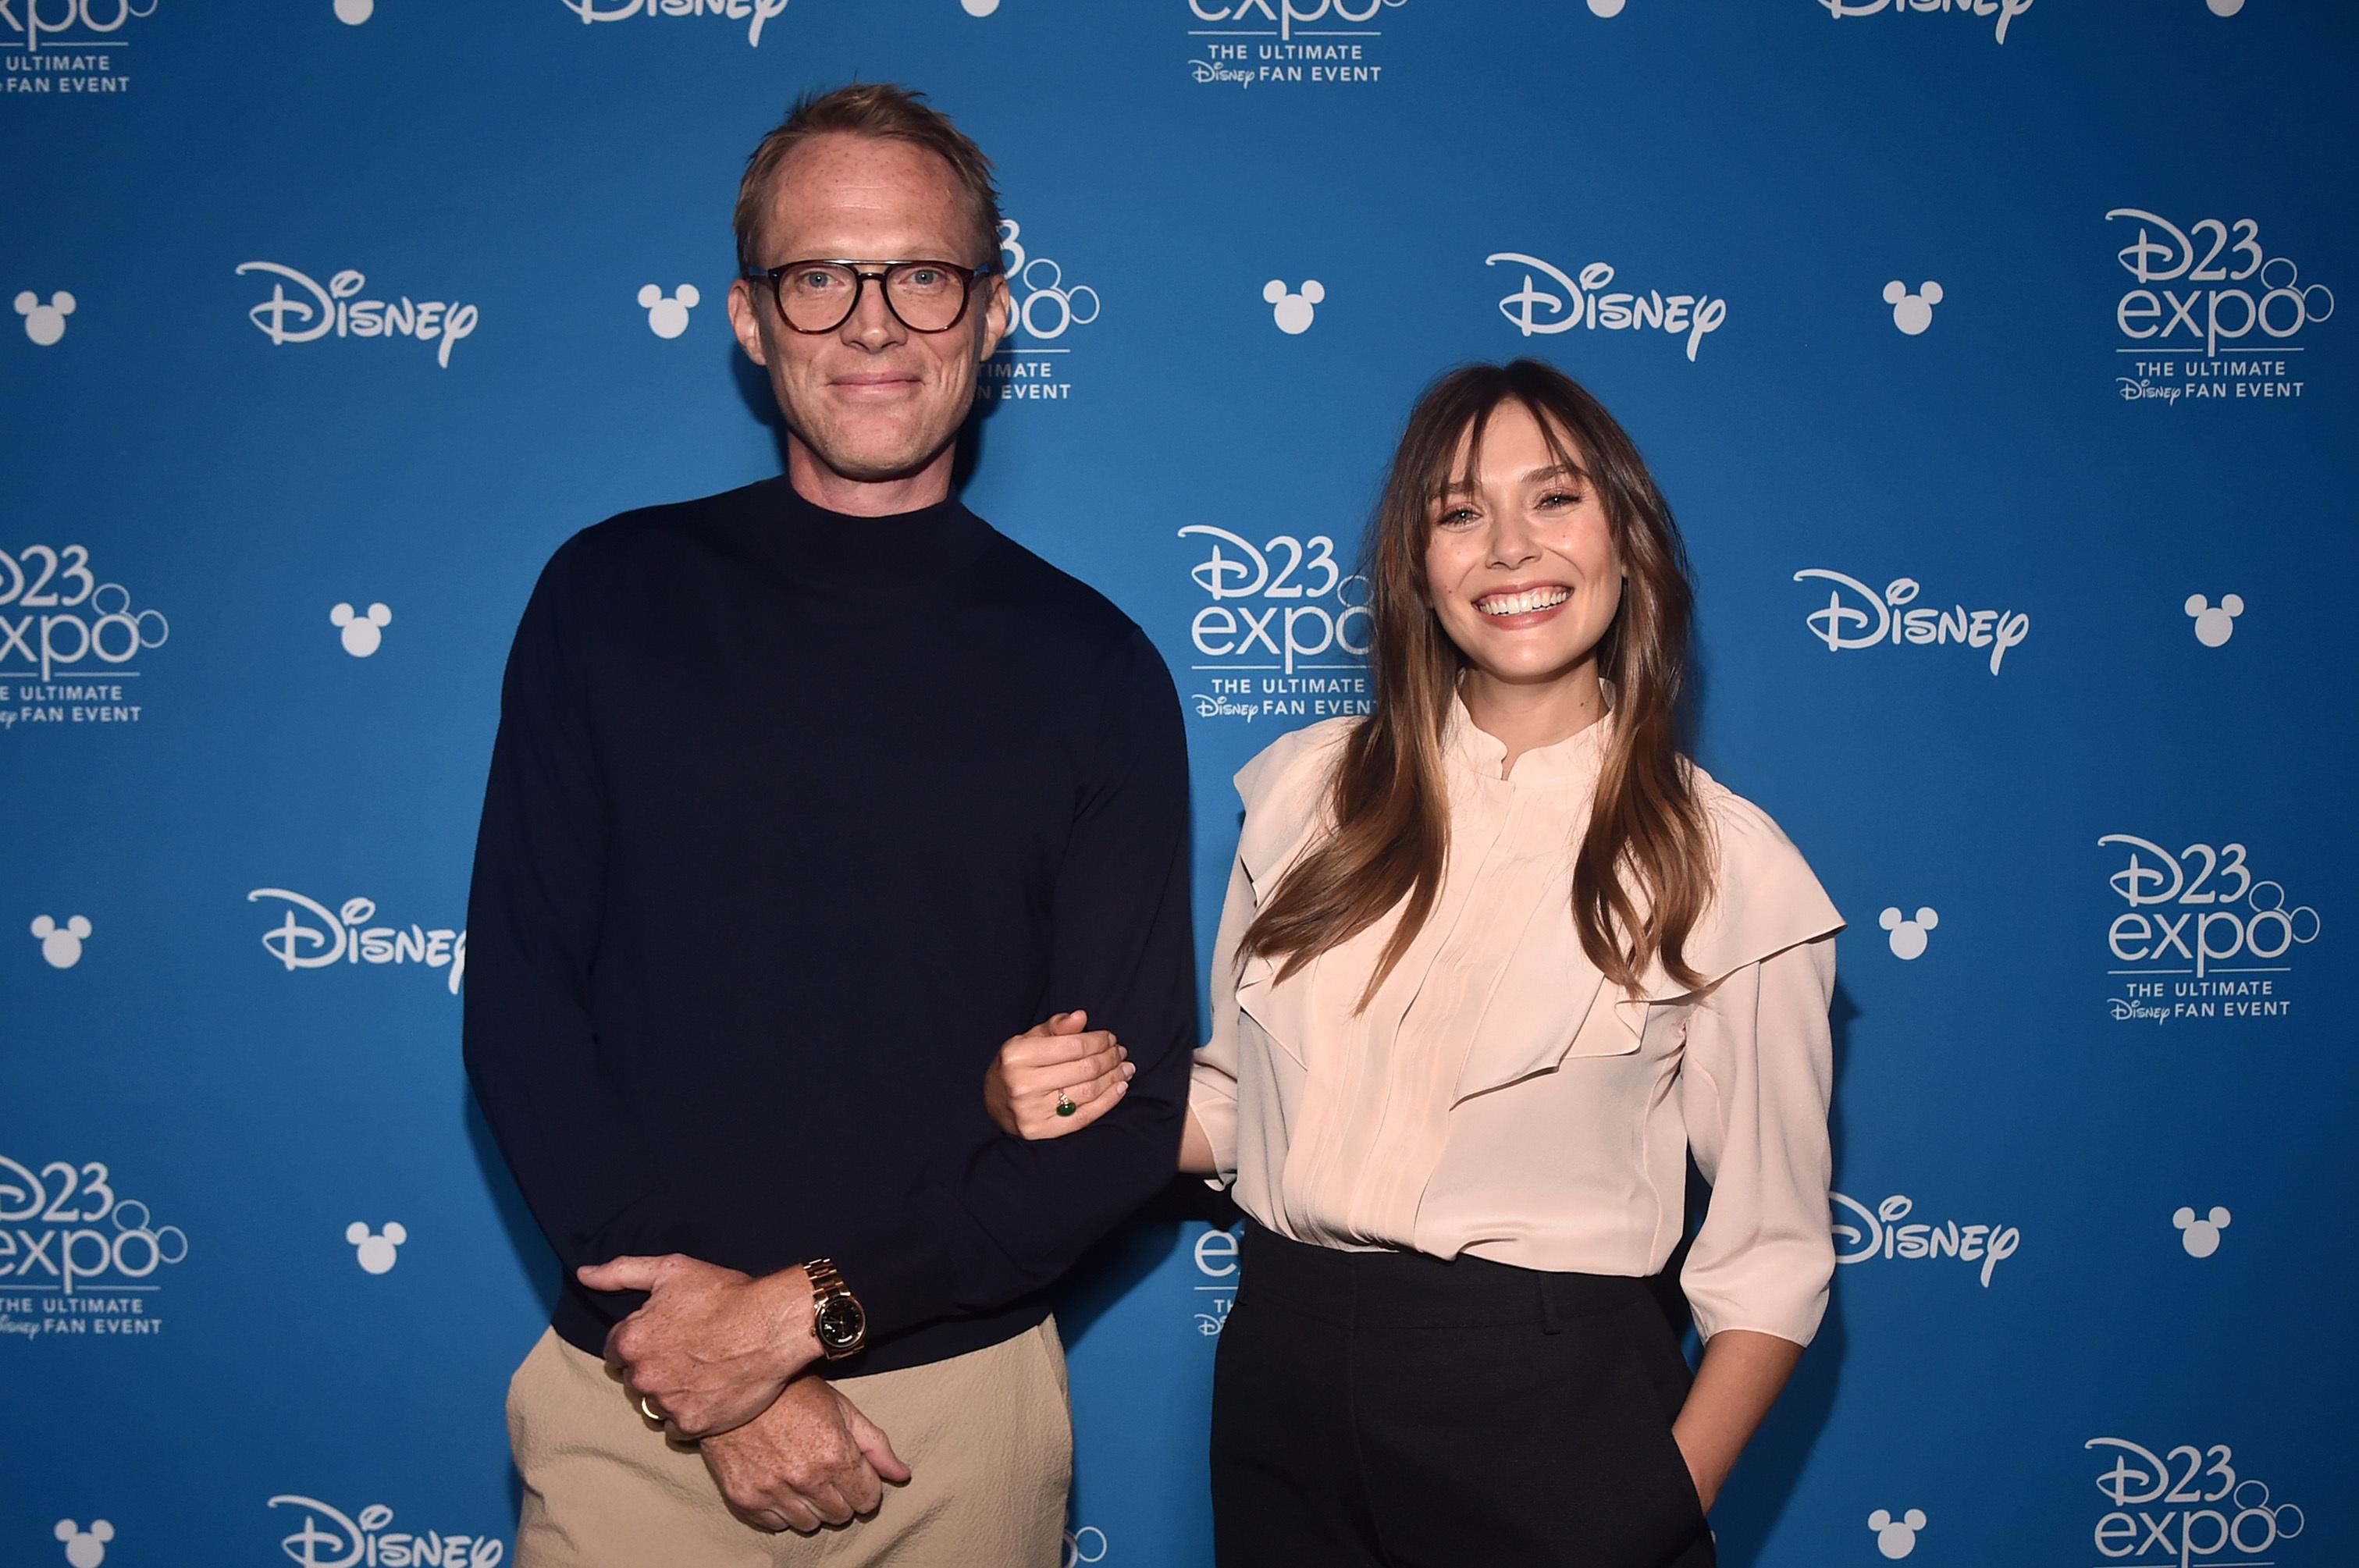 Marvel Studios Wandavision Is Coming To Disney On January 15